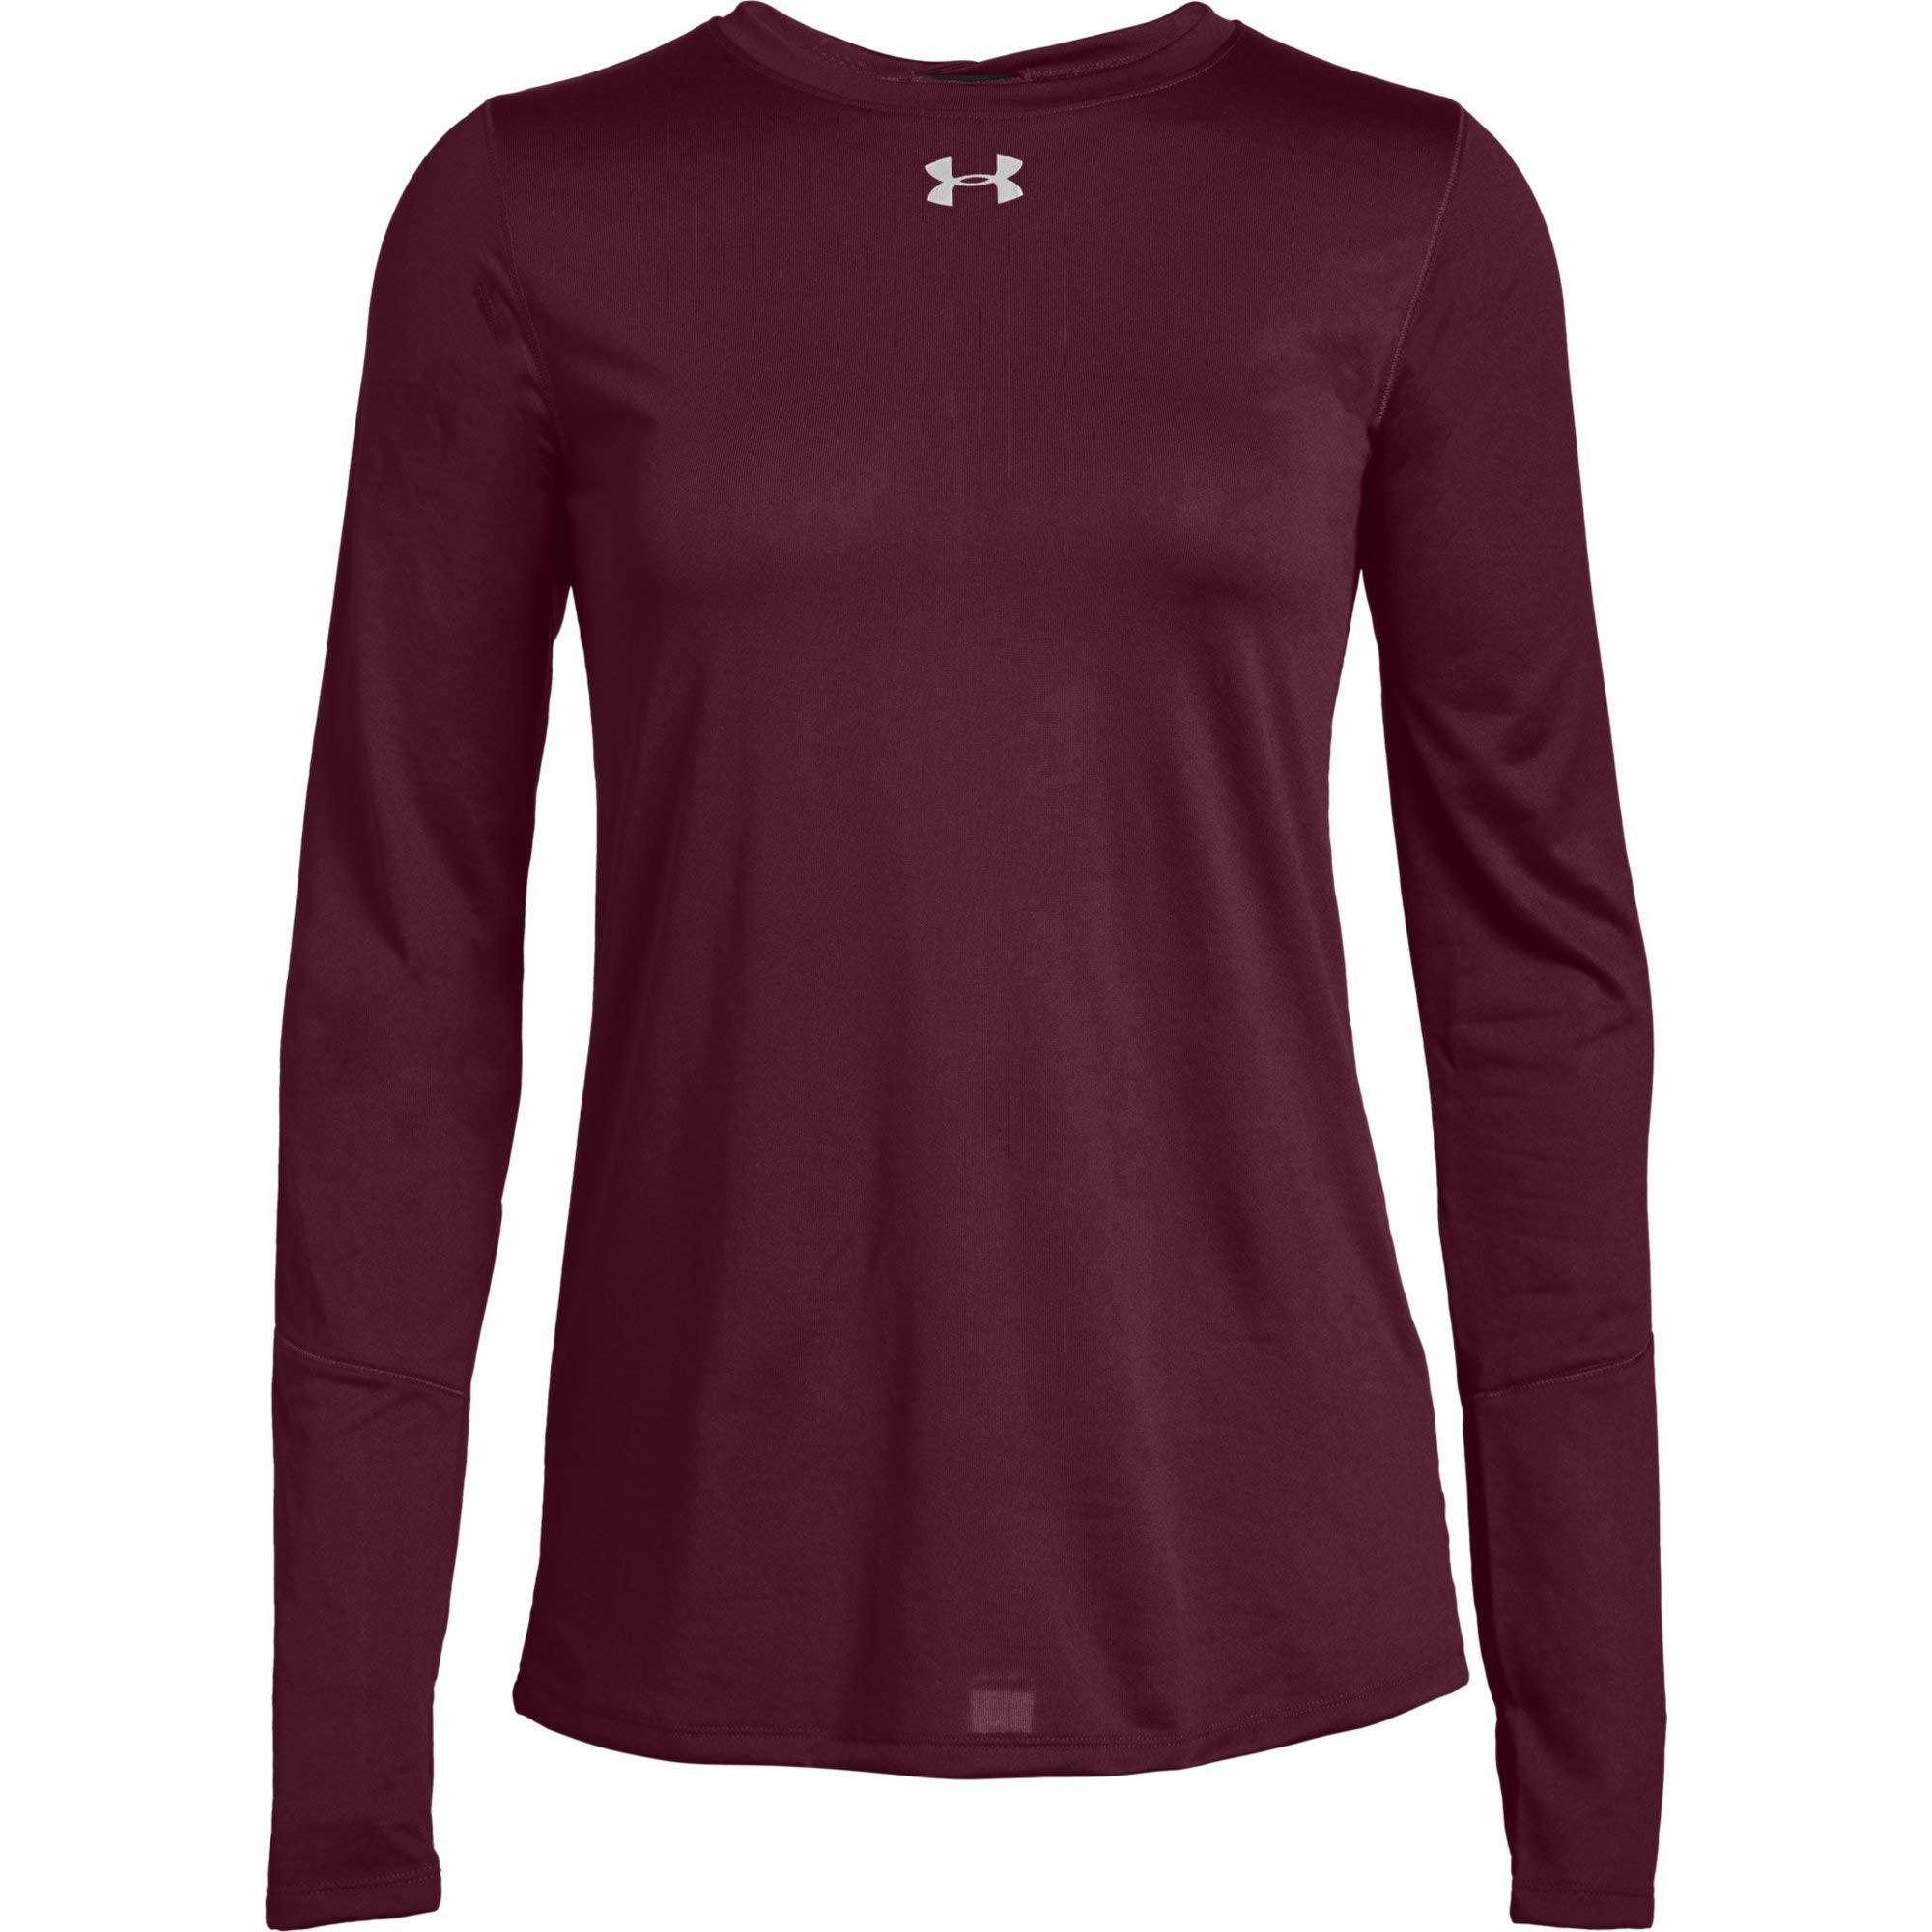 Under Armour Women's UA Long Sleeve Locker T-Shirt (X-Small, Maroon)